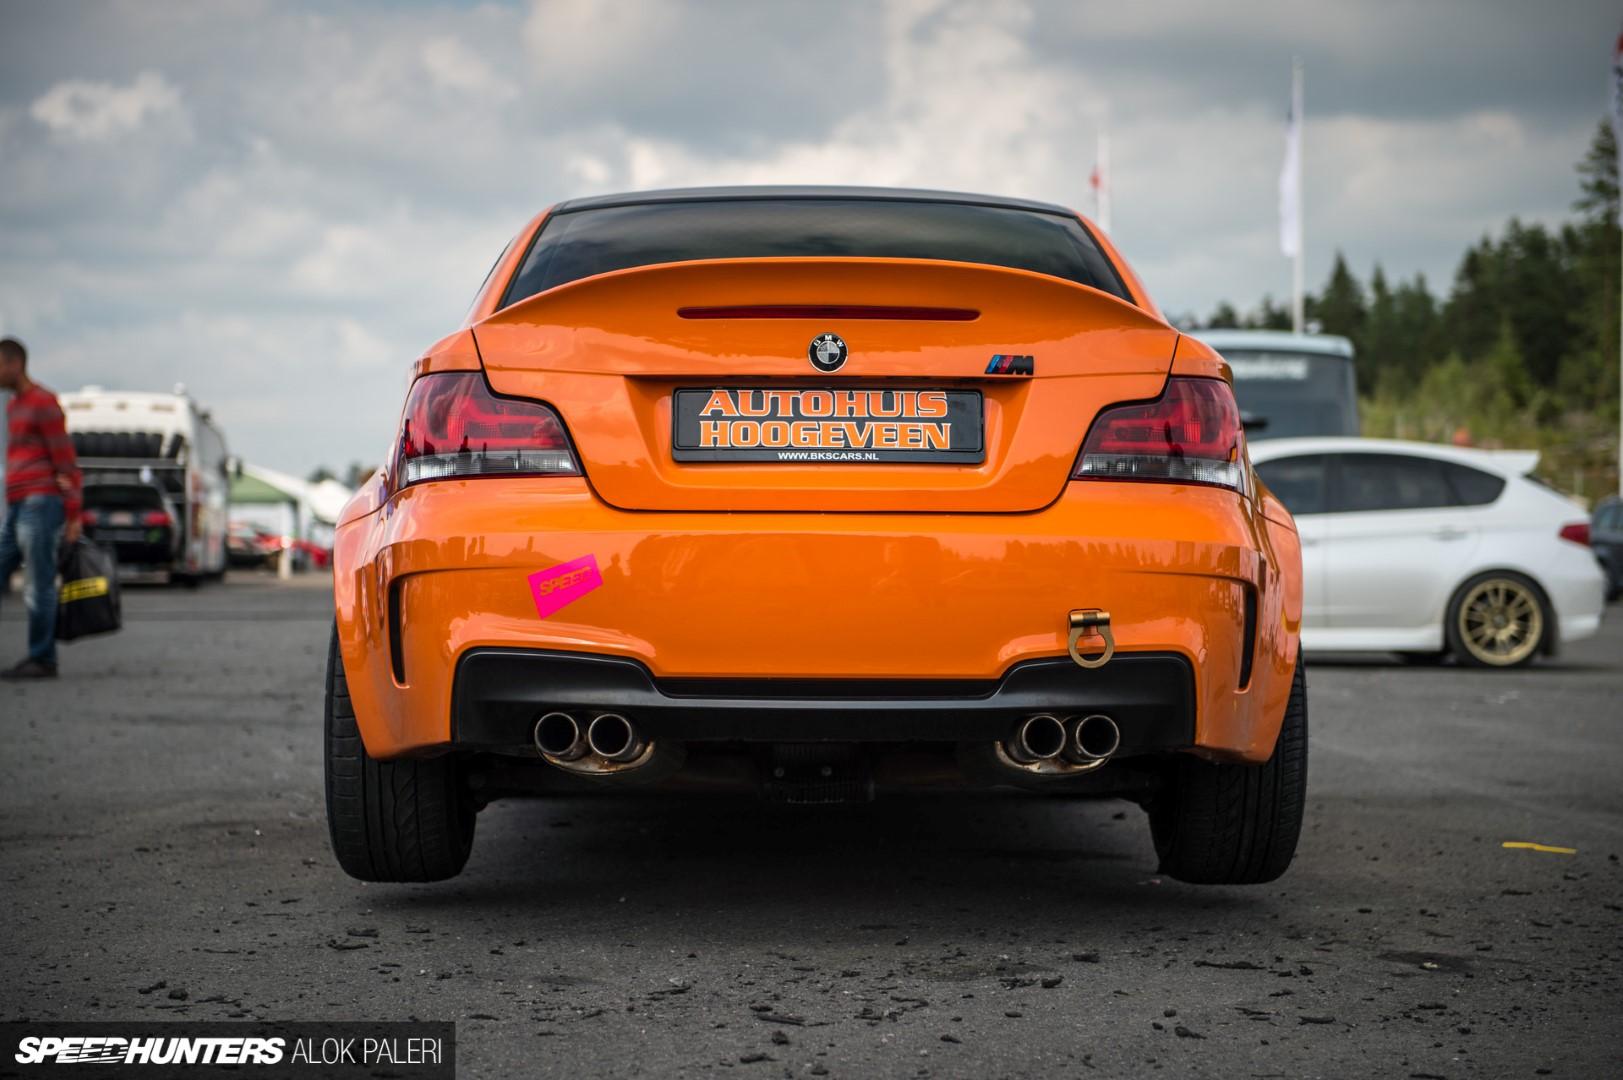 Uničevalec gum: BMW 1M s 5,0-litrskim V10 iz E60 M5 ...